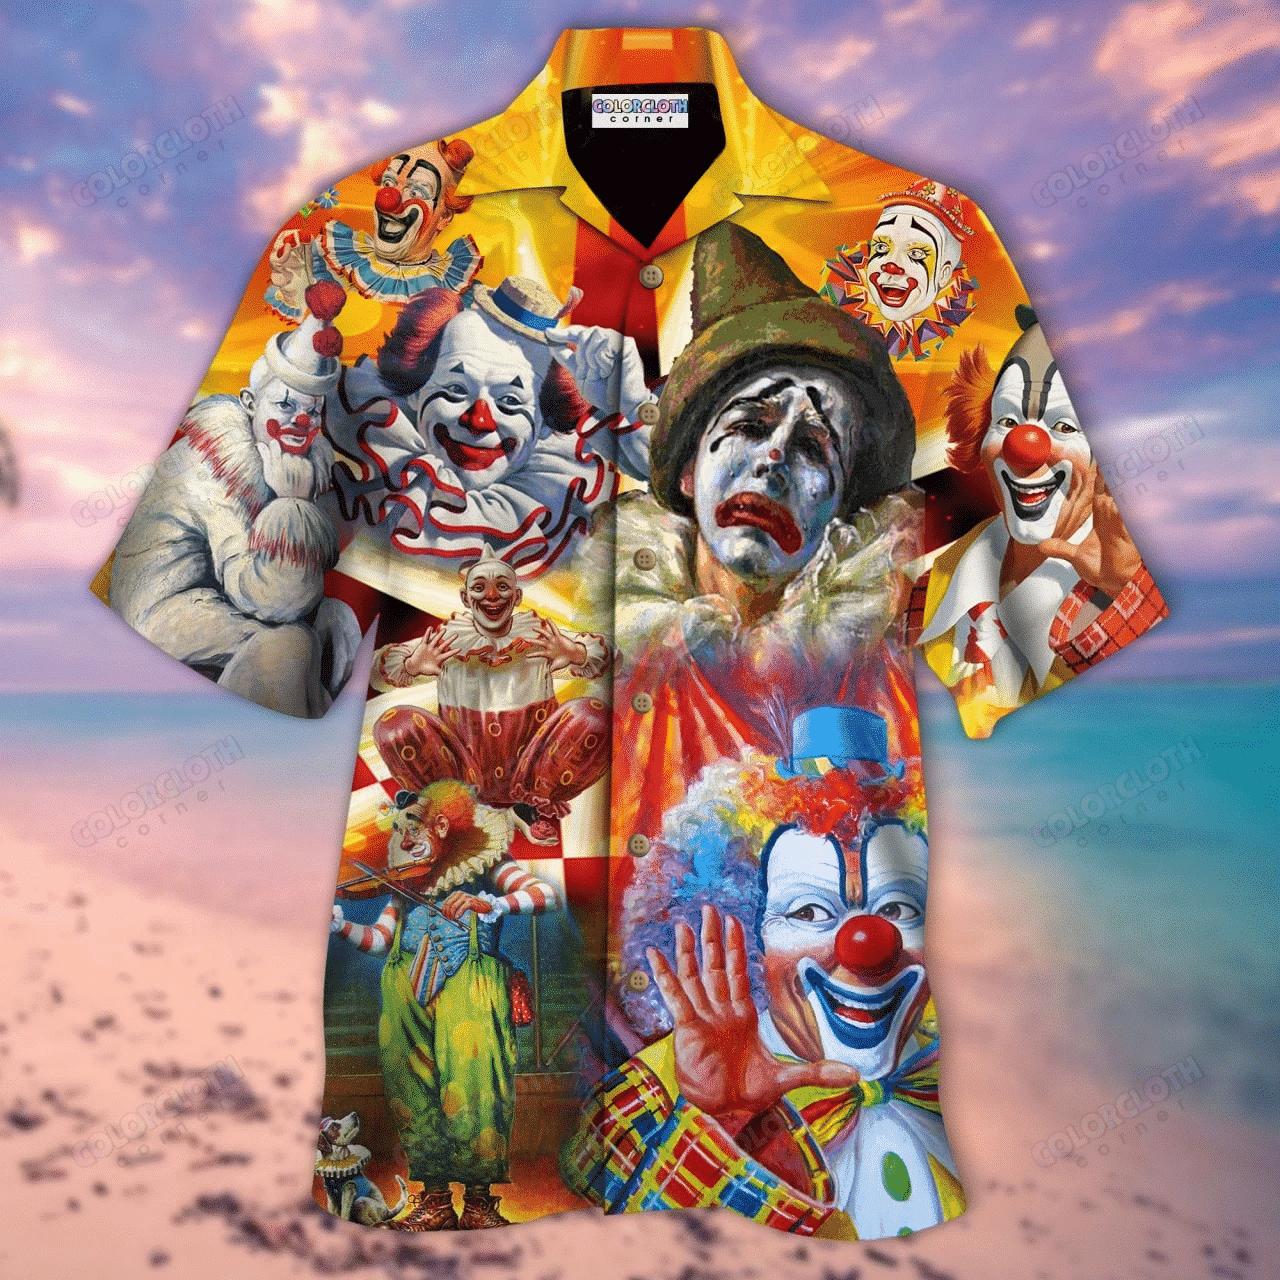 Clowns Smile Now Cry Later Unisex Hawaiian Shirt TY294107